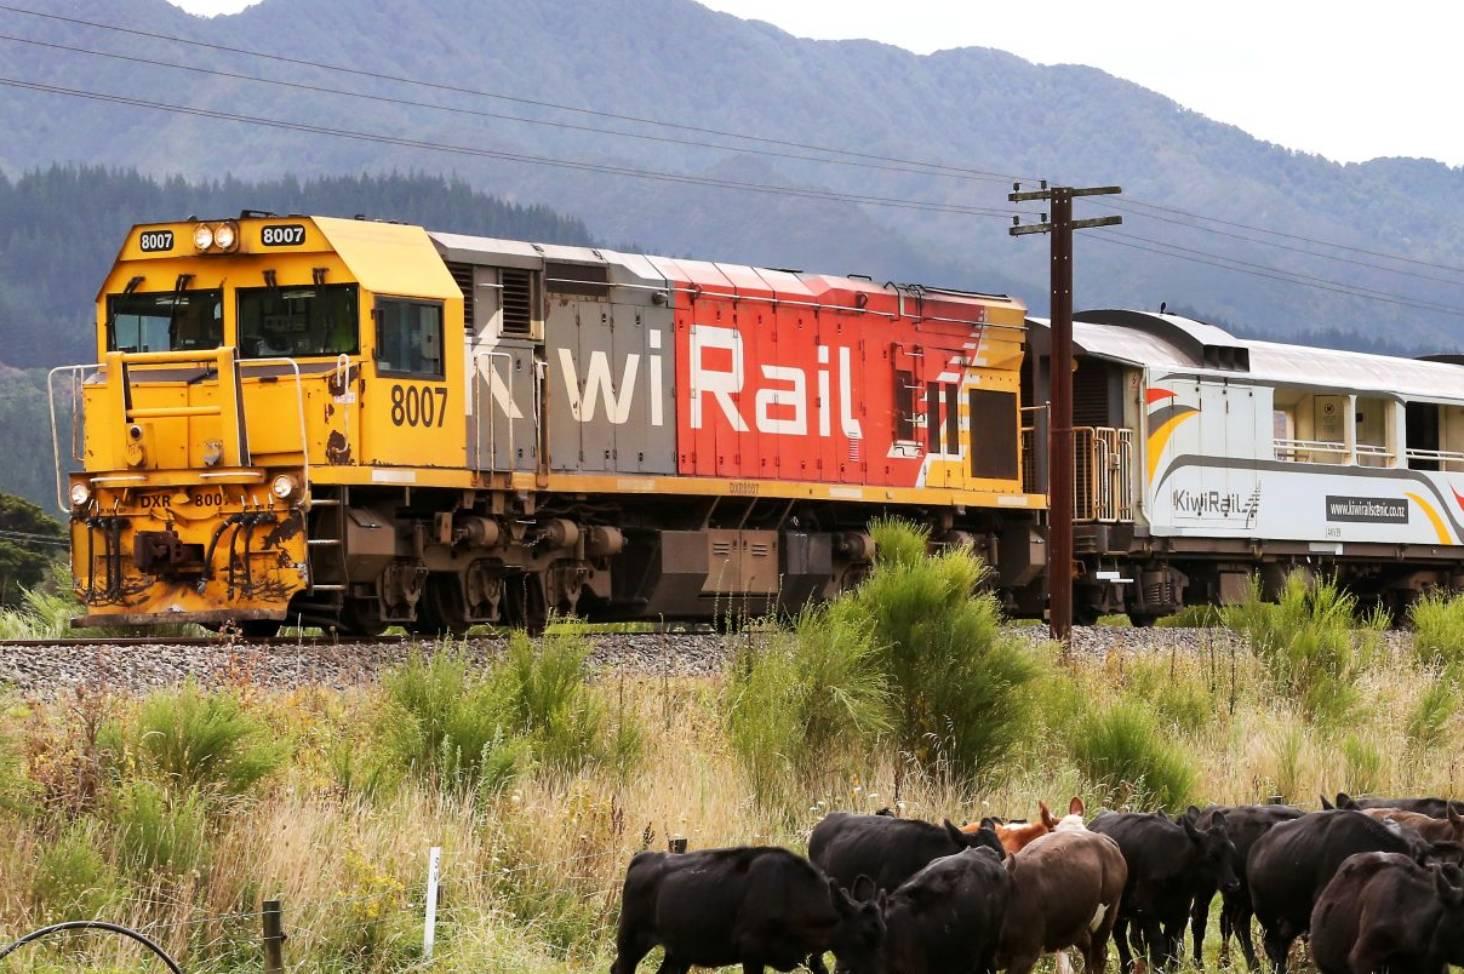 KiwiRail has priced Kiwis off its trains, yet taxpayers fork